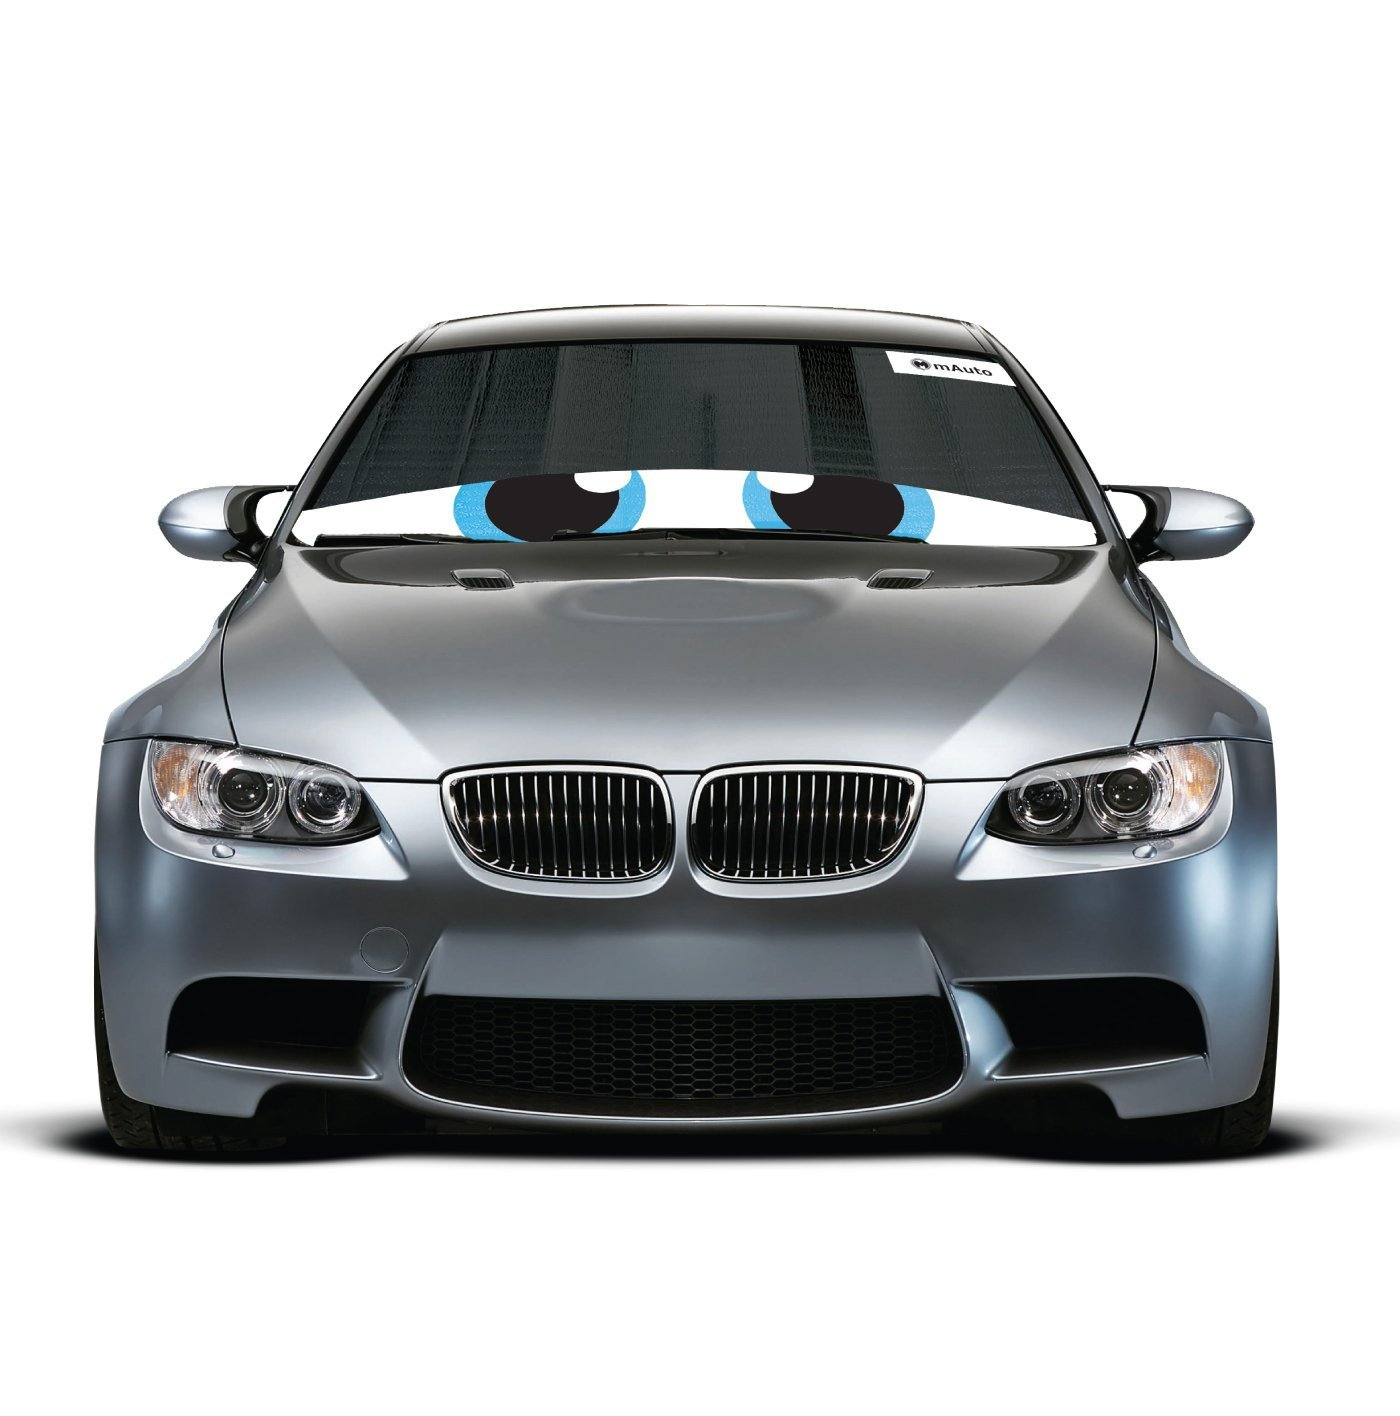 Sun Shades For Cars : Creative car sun shades to keep your cool gift canyon